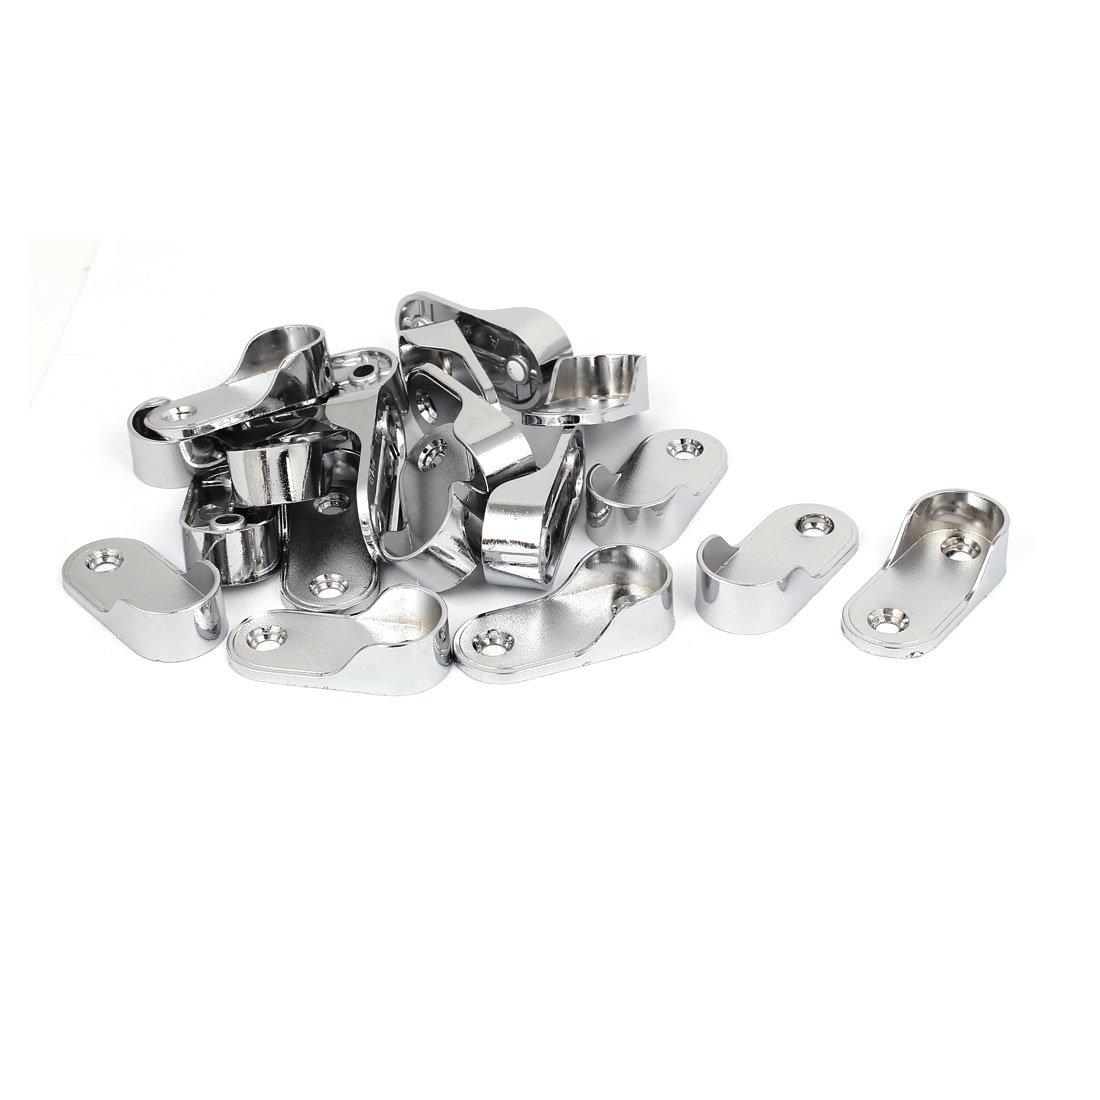 uxcell Wardrobe Zinc Alloy Rod End Support Bracket Holder 20pcs for 19mm Dia Tube